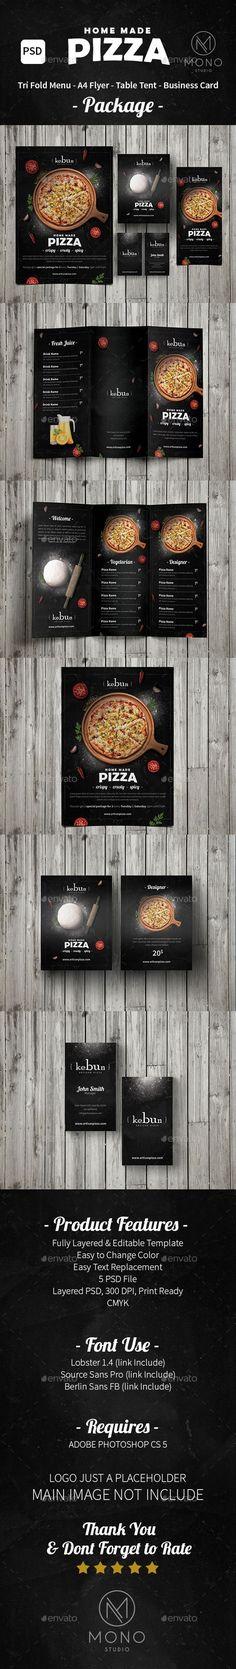 Pizza Menu Set / Rustic Template PSD #design Download: http://graphicriver.net/item/pizza-menu-setrustic/14221285?ref=ksioks